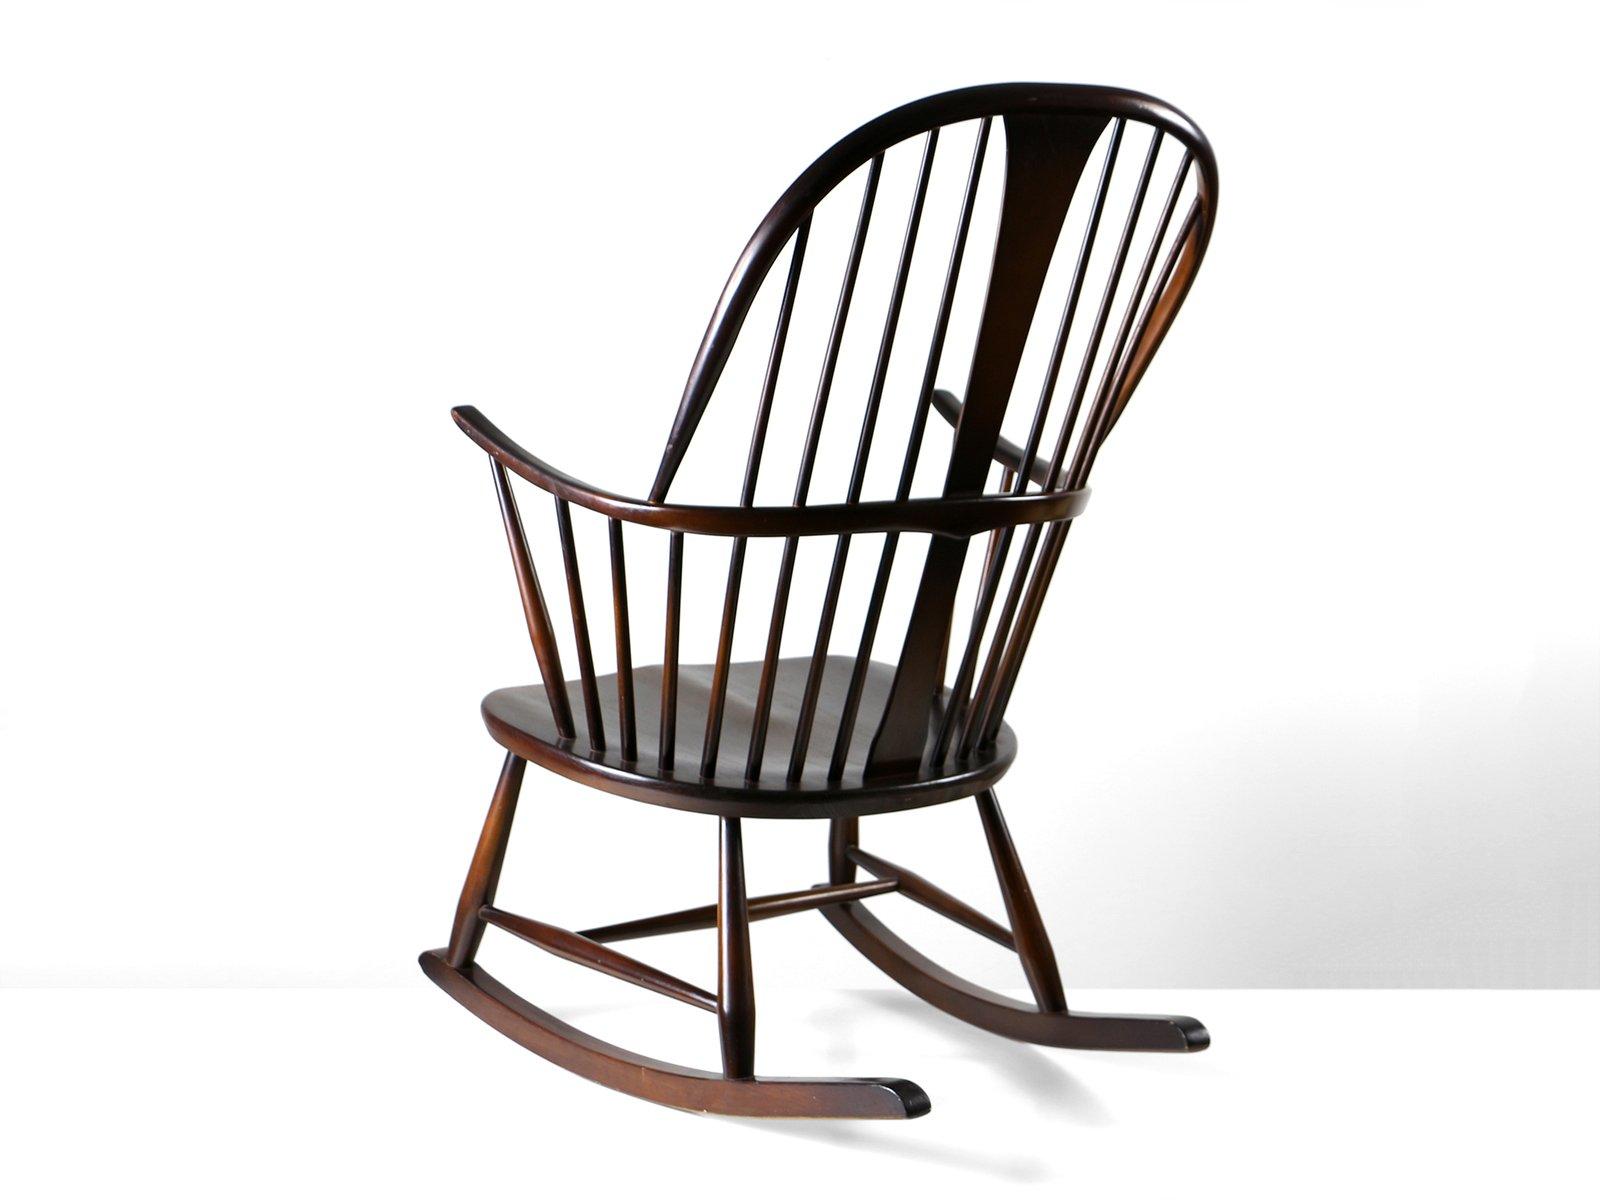 next market swedish previous rocking century johanson by design mid chair